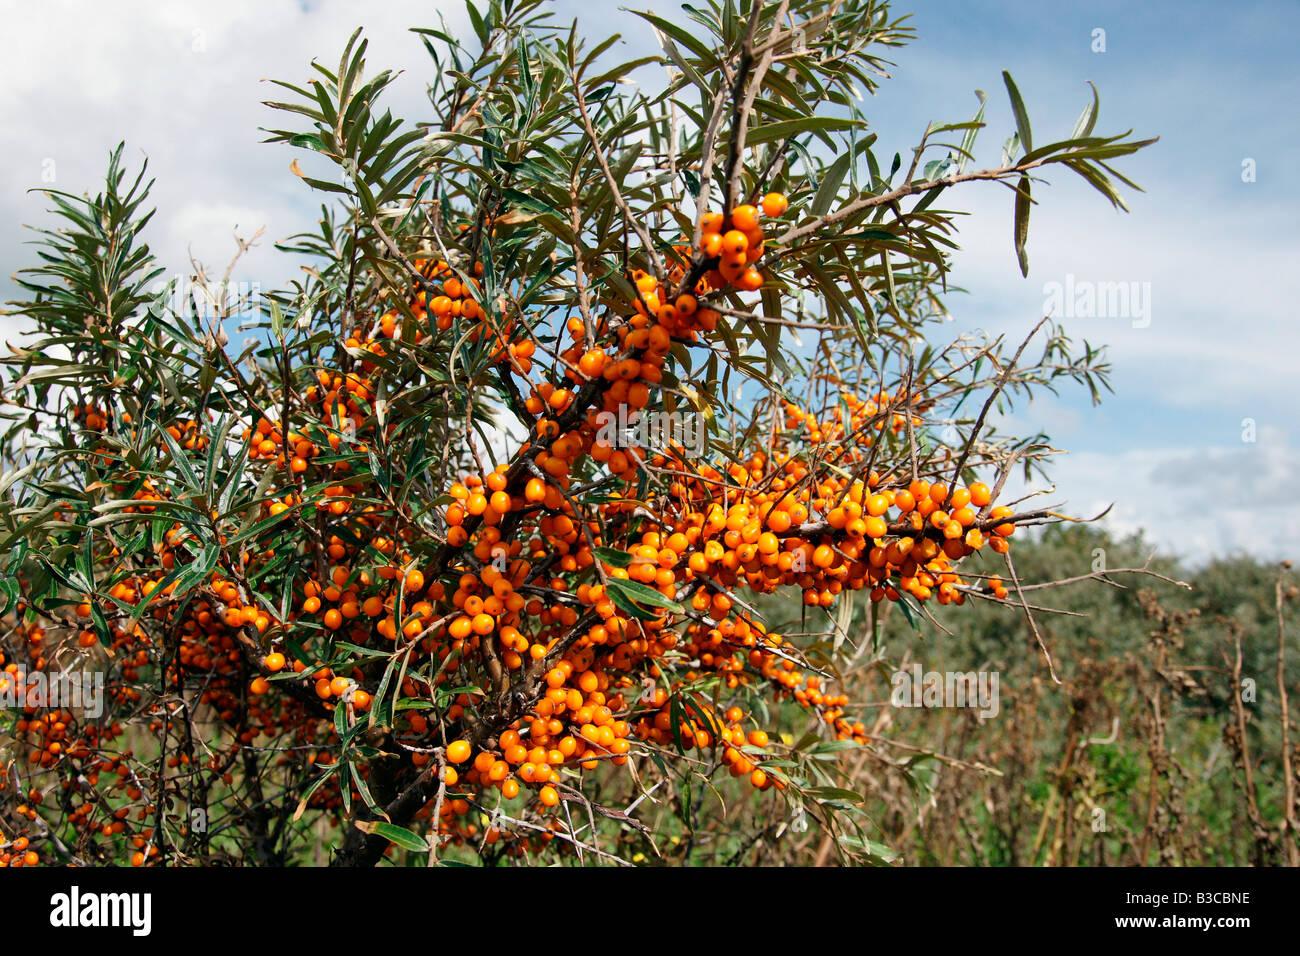 Tsetsalulu Seabuckthorn Bush Shrub Orange Berries Branch Growing